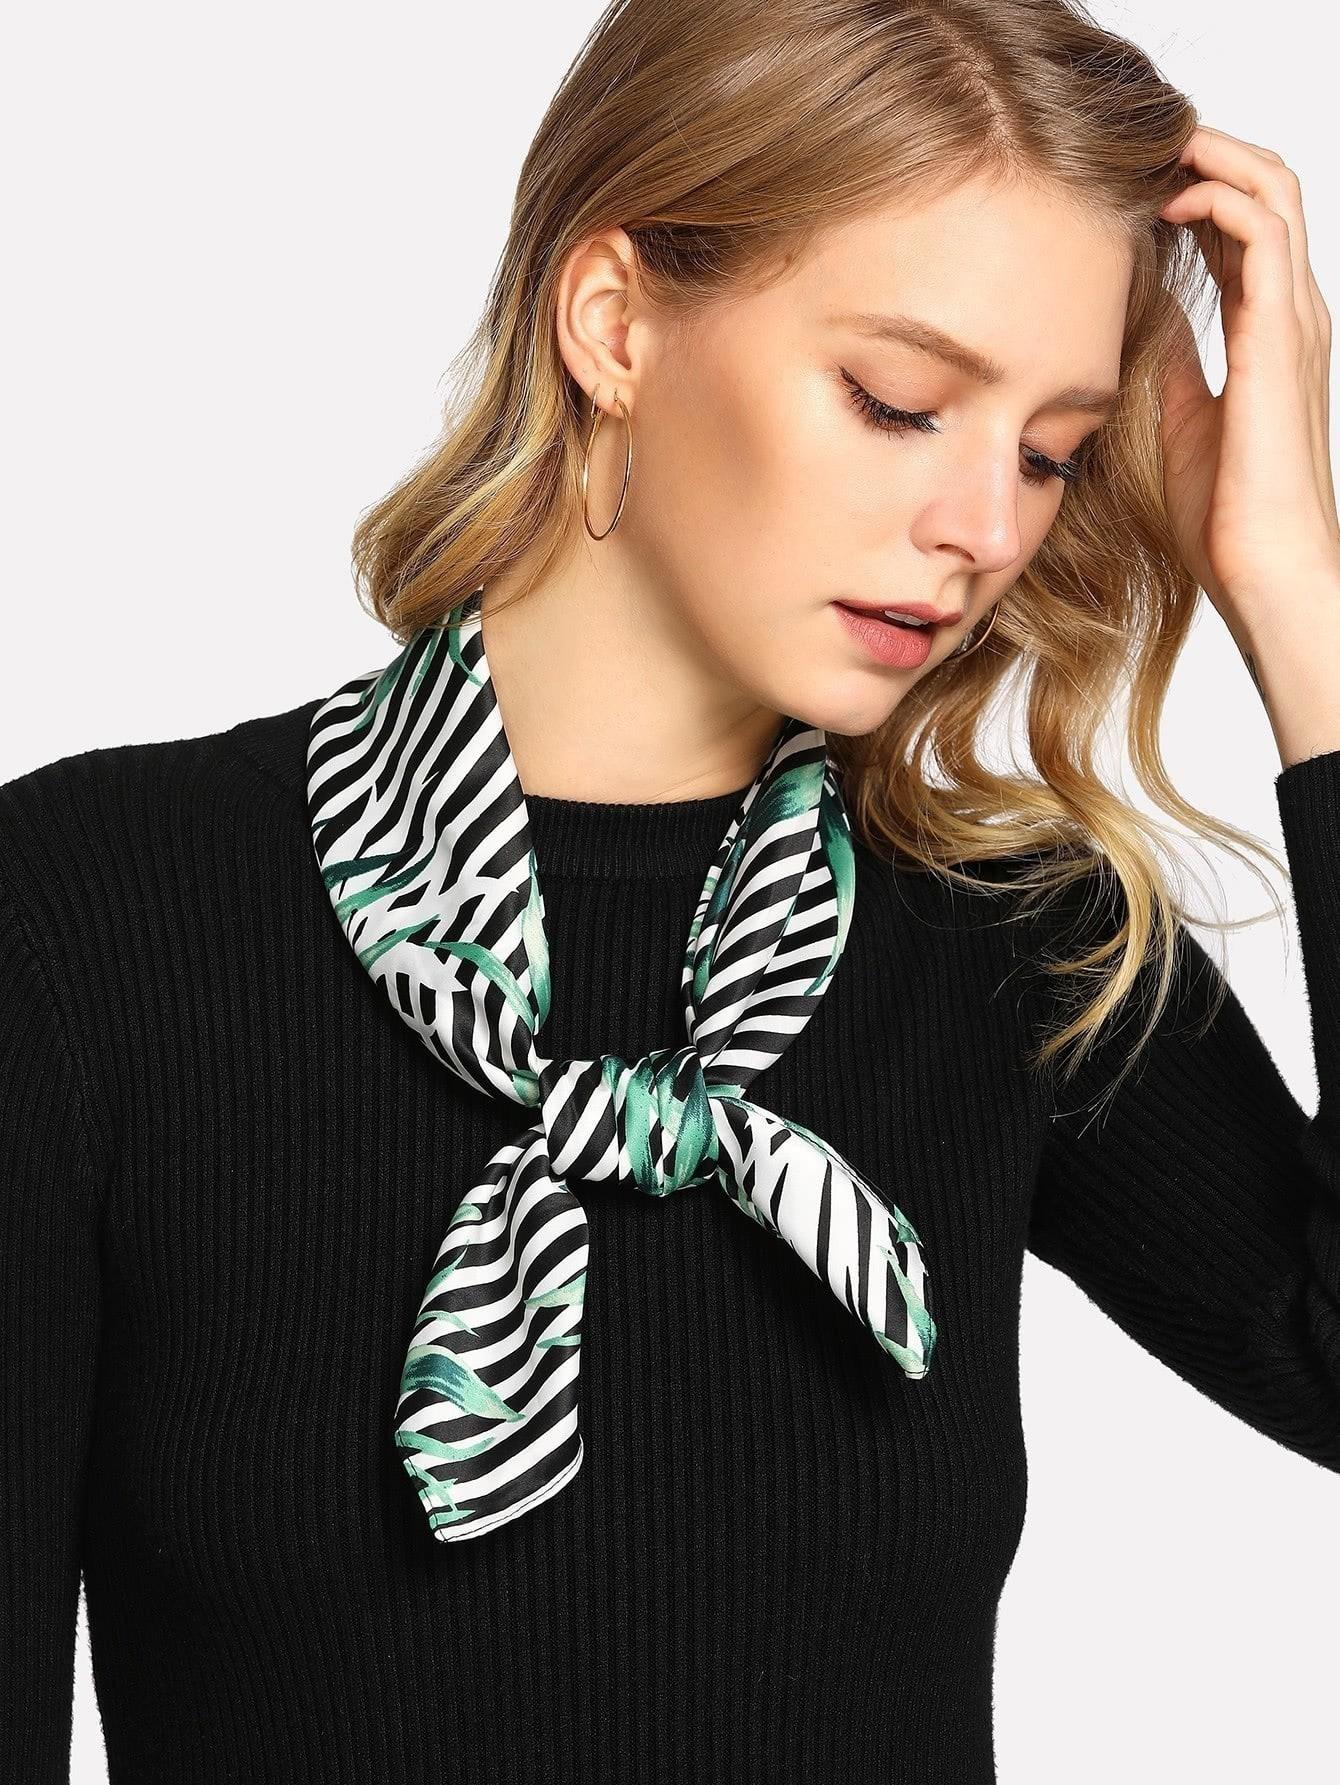 Leaf Print Striped Bandana calico print satin bandana